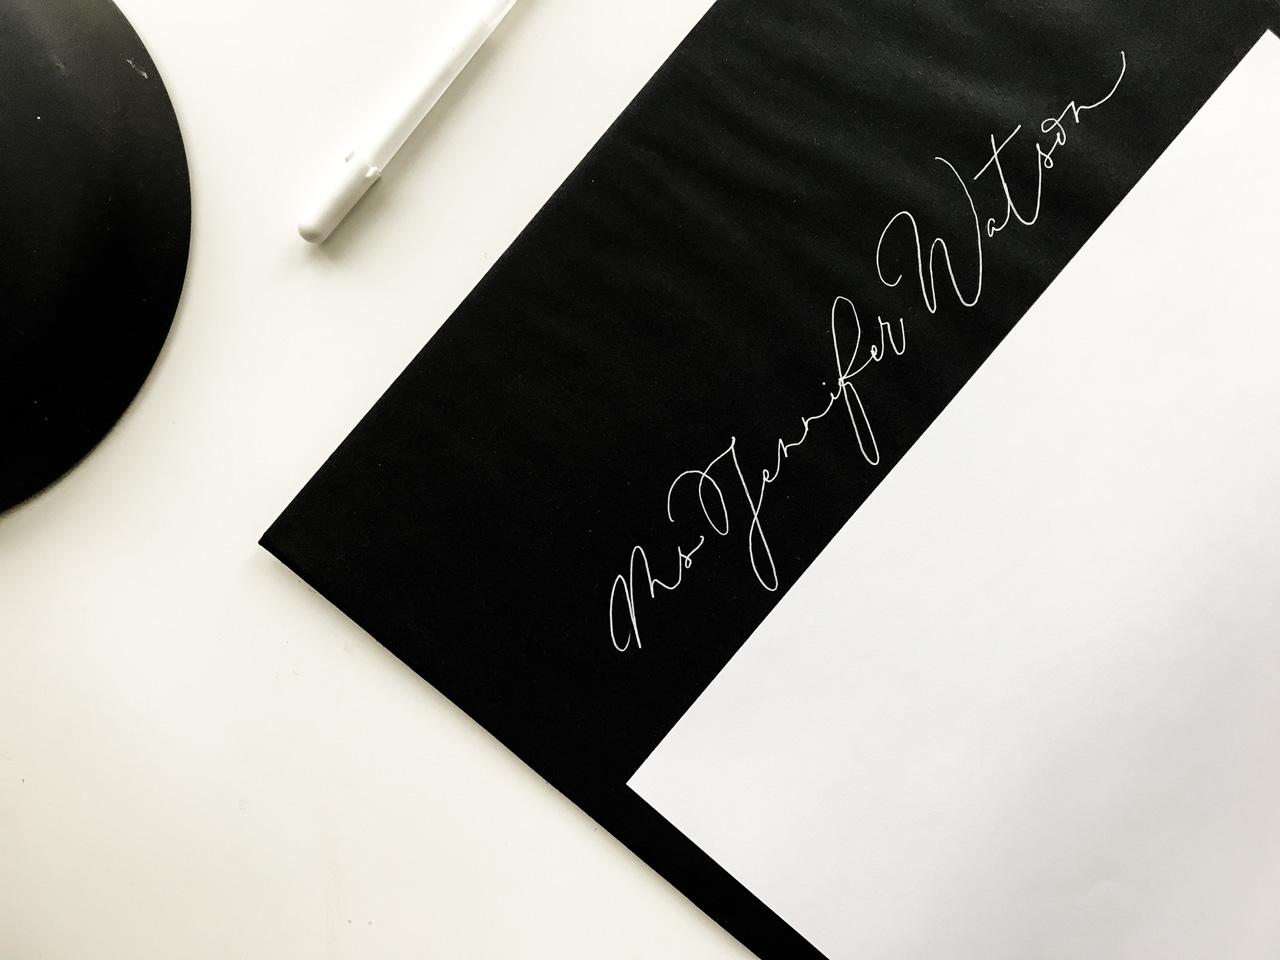 freehand envelope addressing monoline calligraphy